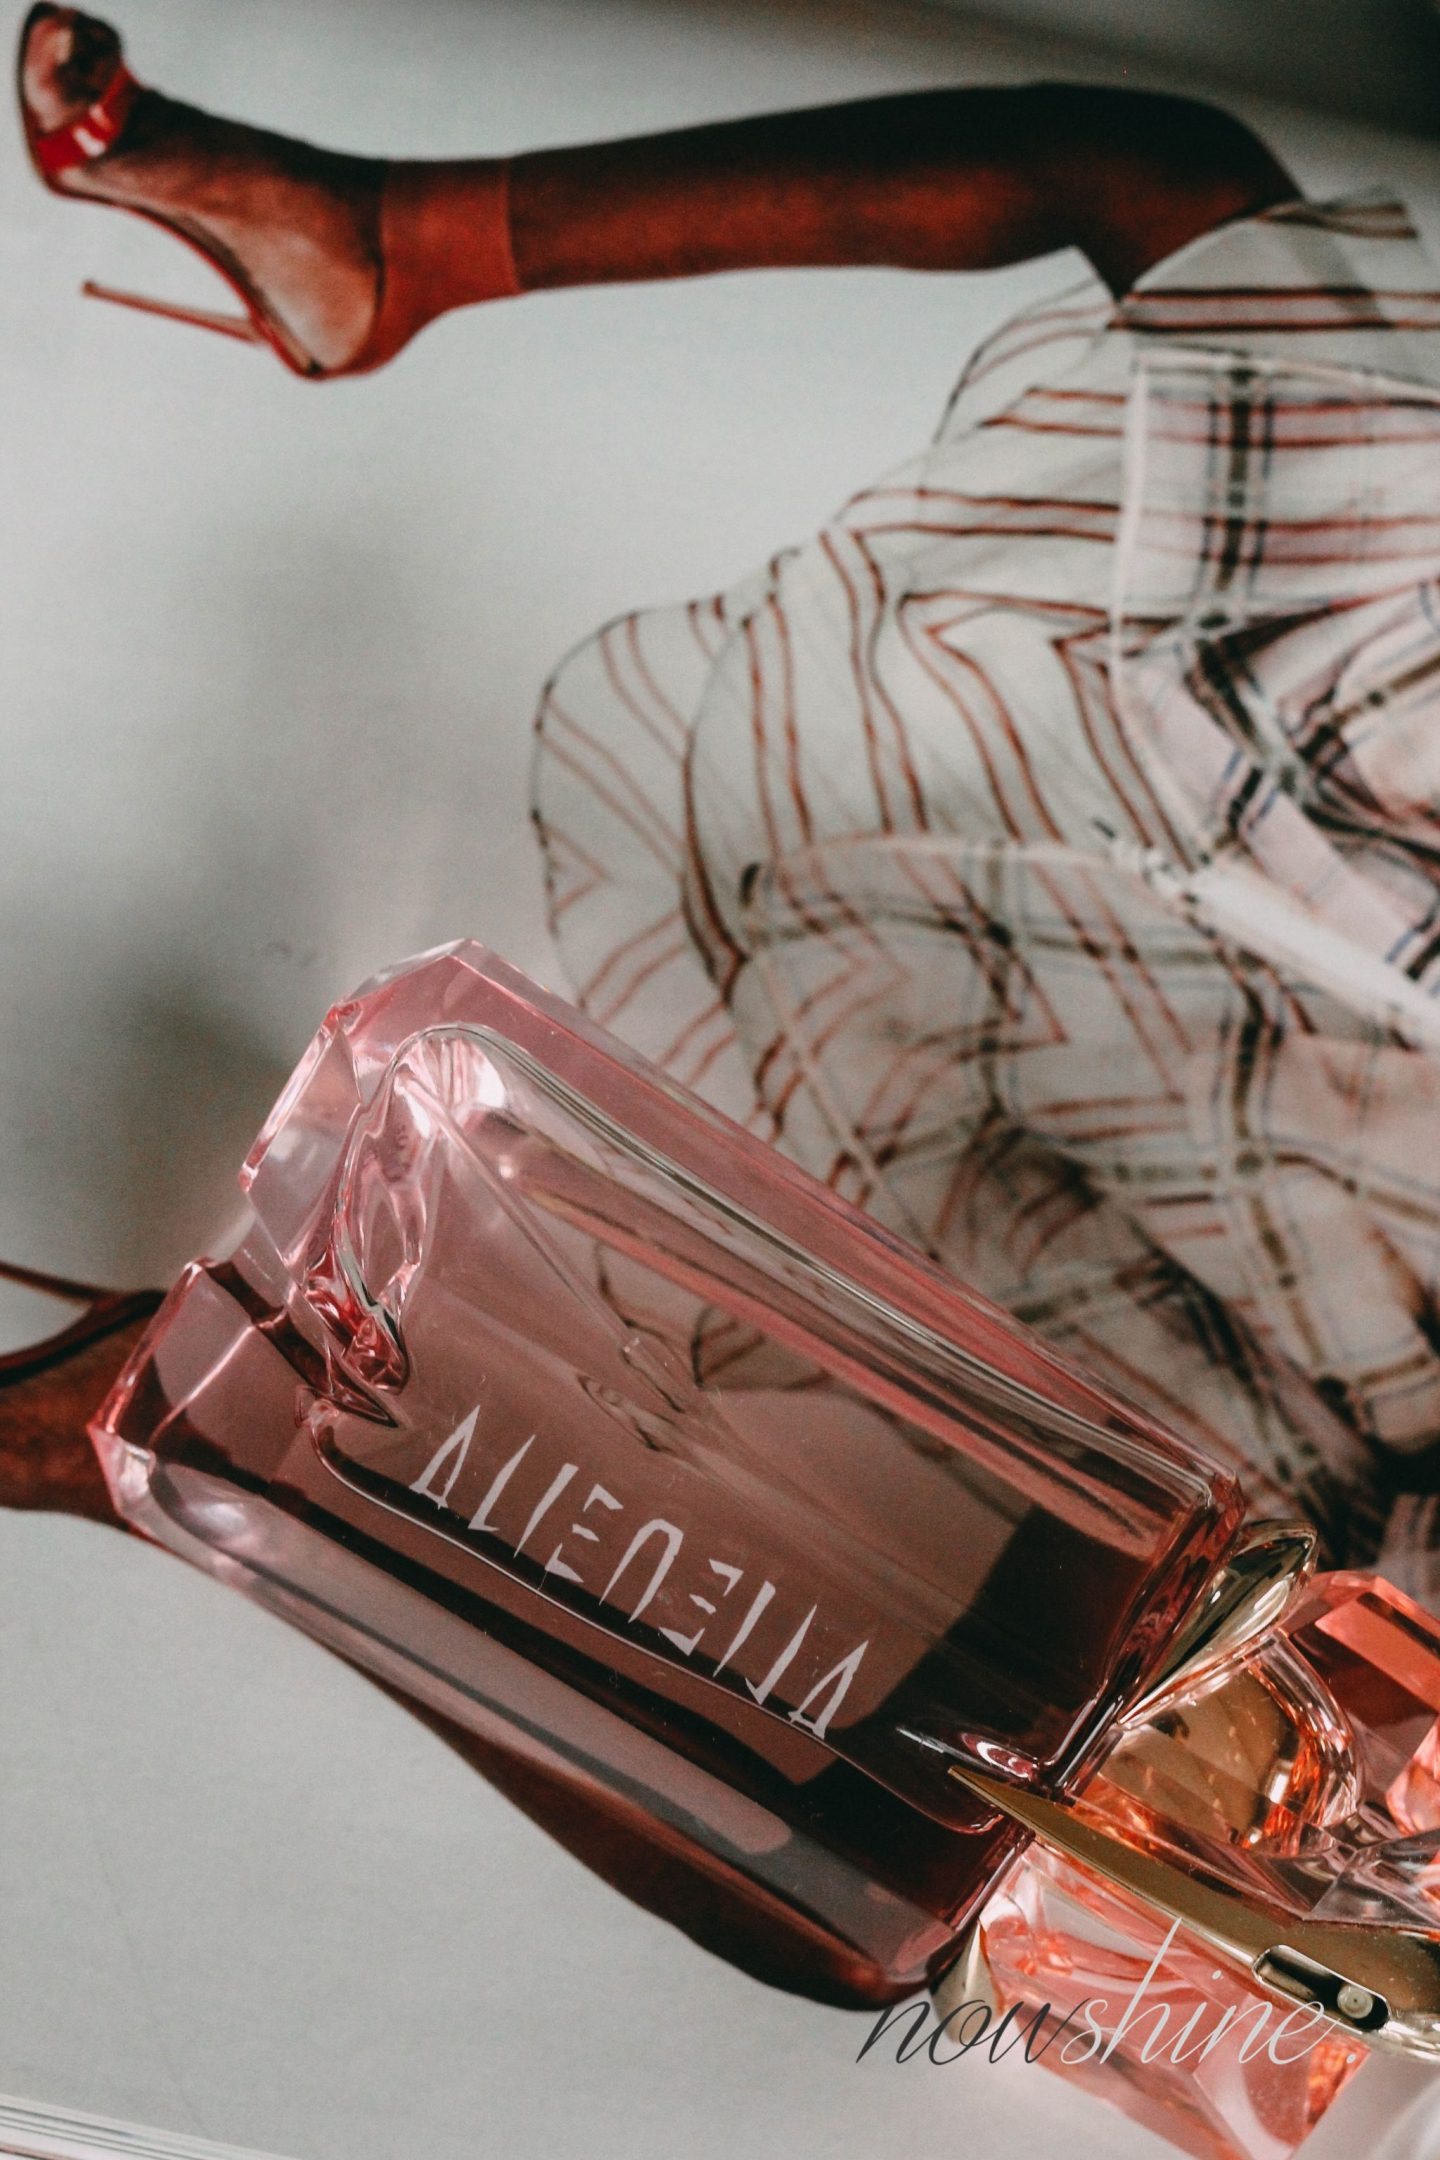 Alien Flora Futura Lieblingsduft Review - Nowshine Beauty Lifestyle Blog über 40